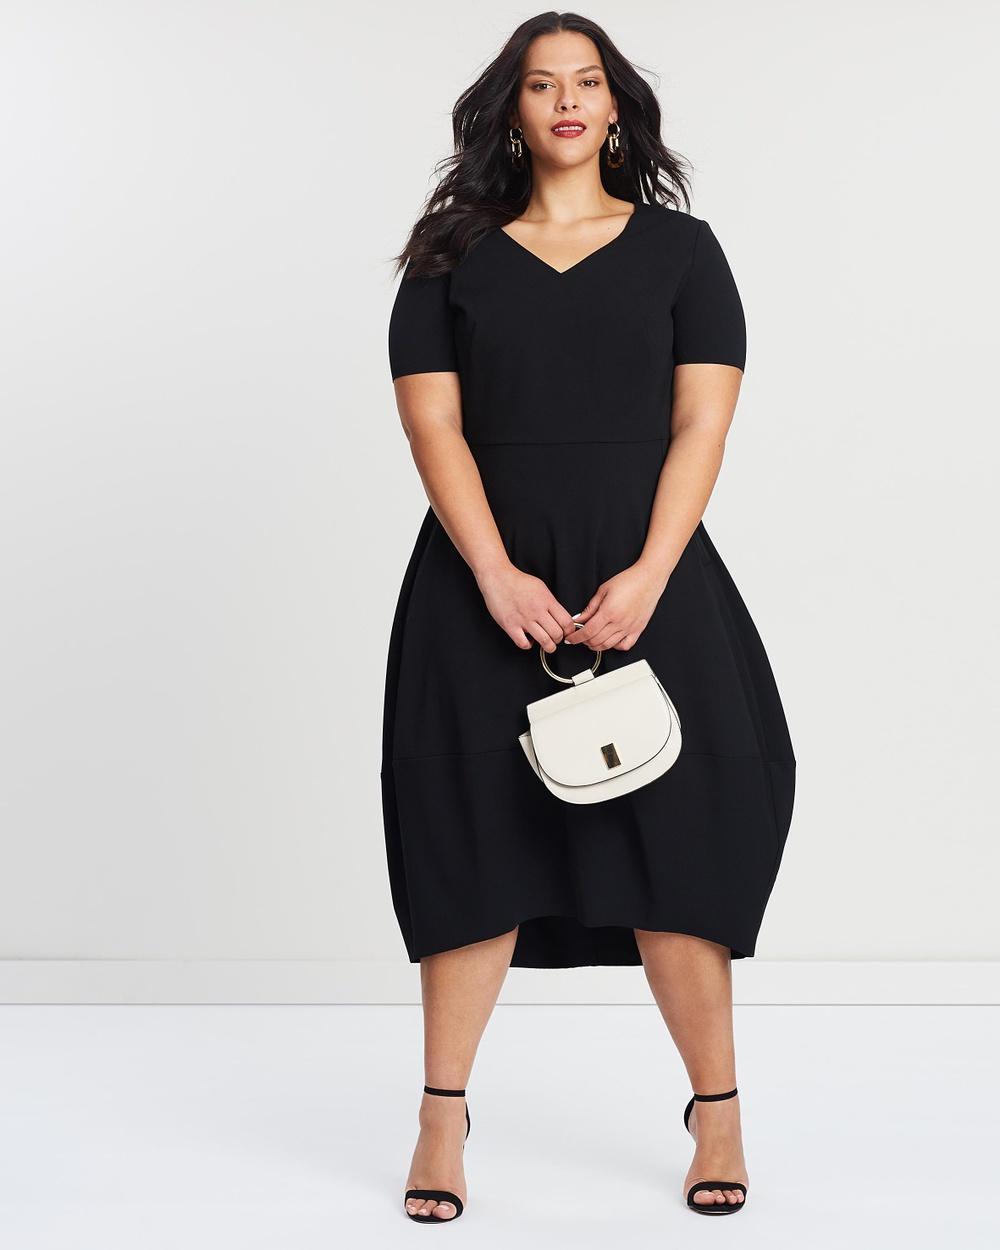 Persona by M.Rinaldi Black Ode Dress